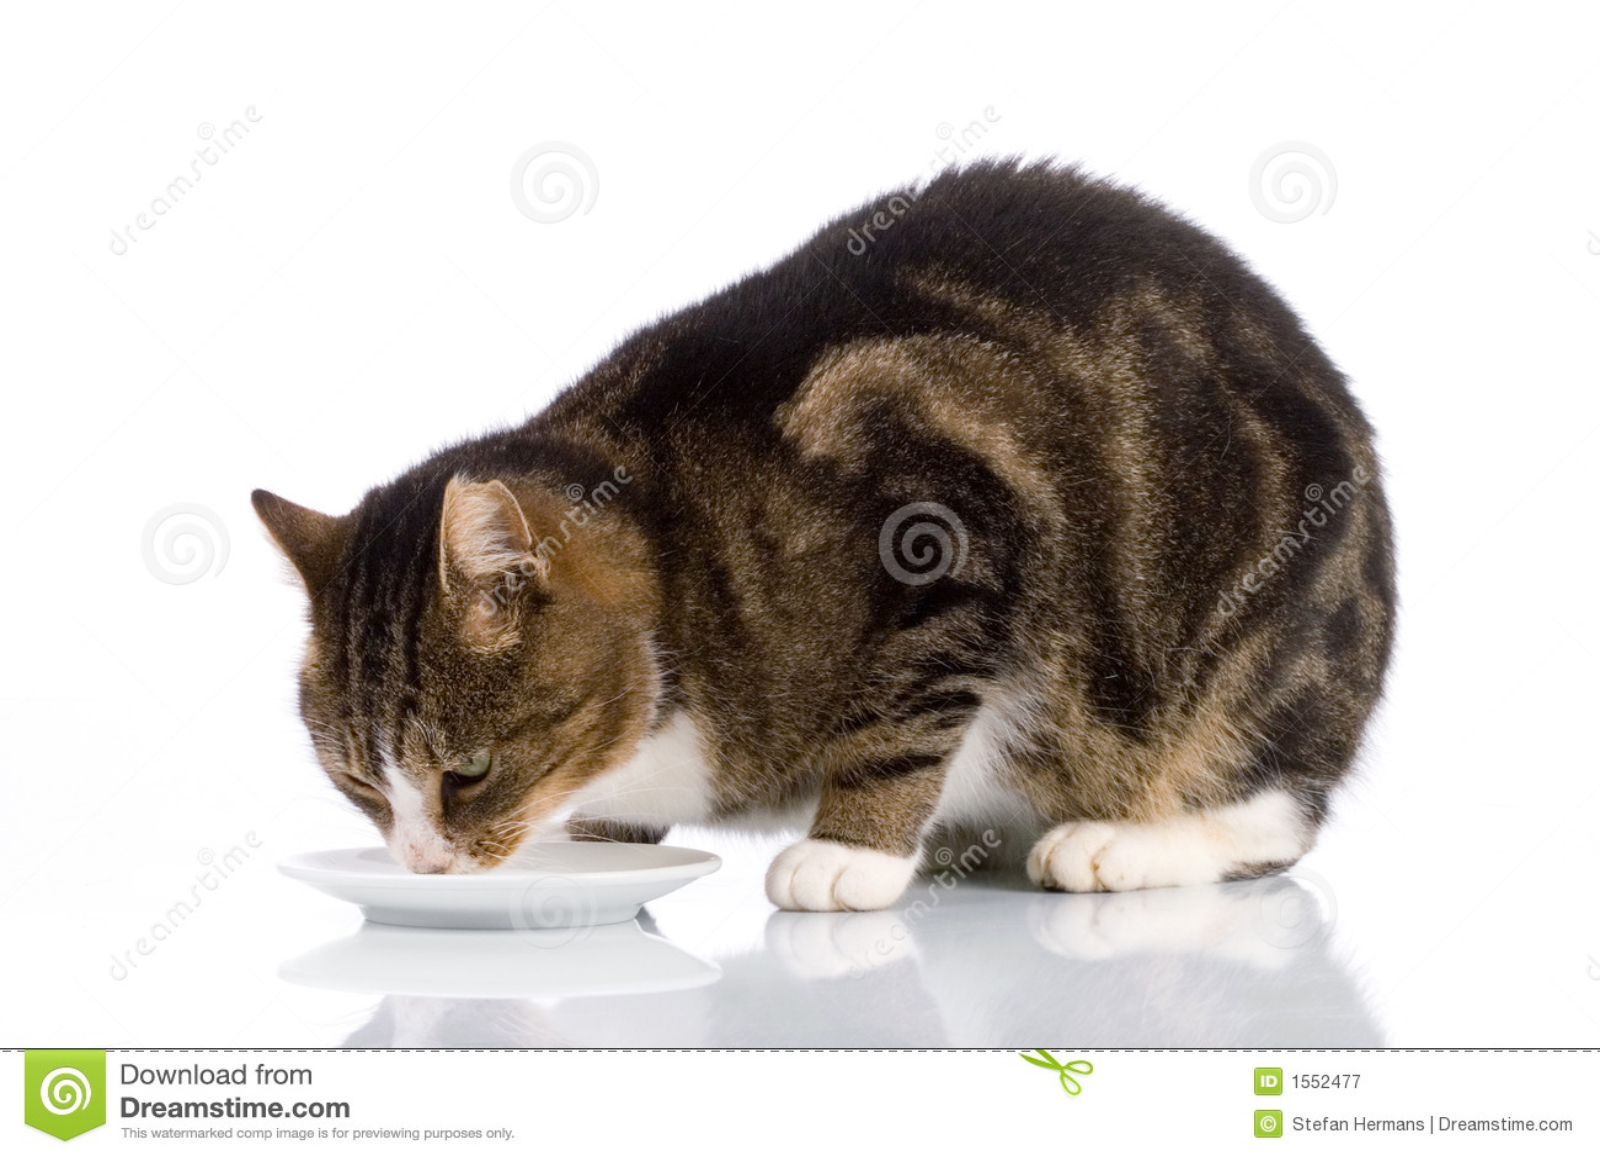 Hairy cats eat milk